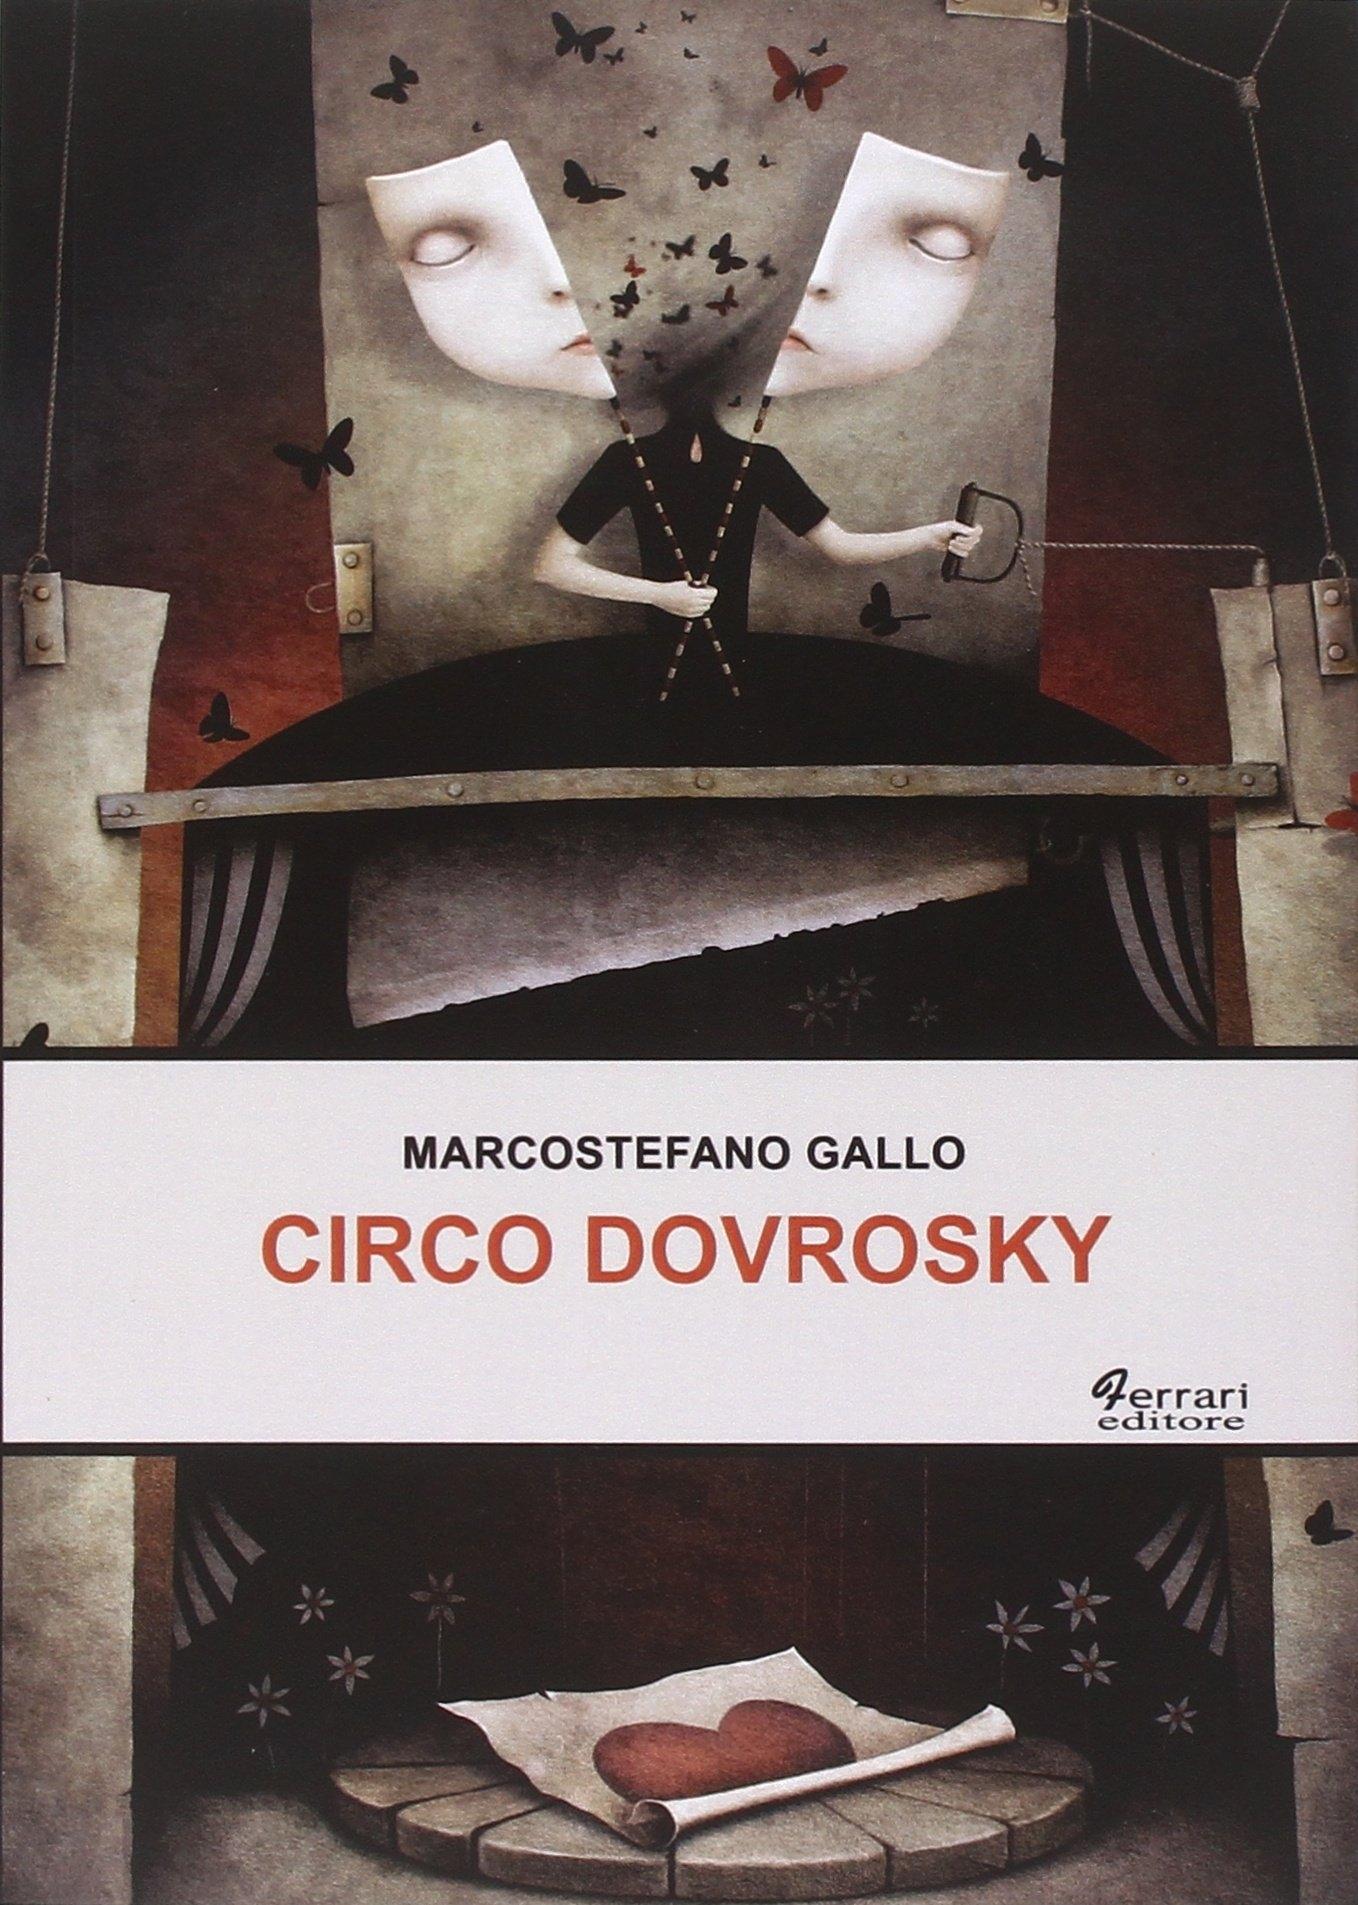 Circo Dorvosky